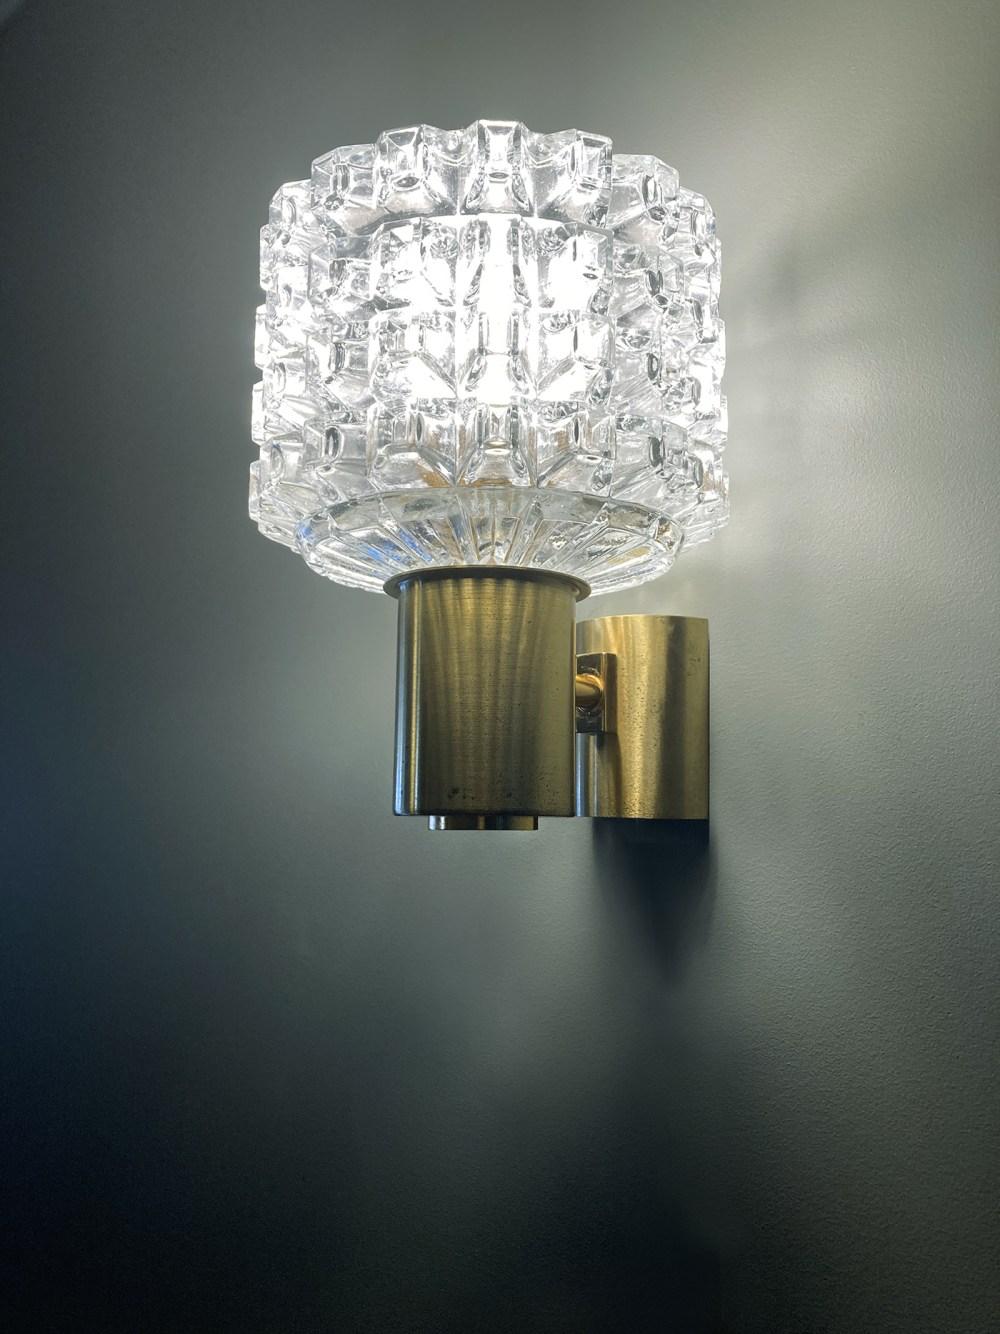 applique vintage en verre diamant 1960. luminaires vintage ltgmood.com